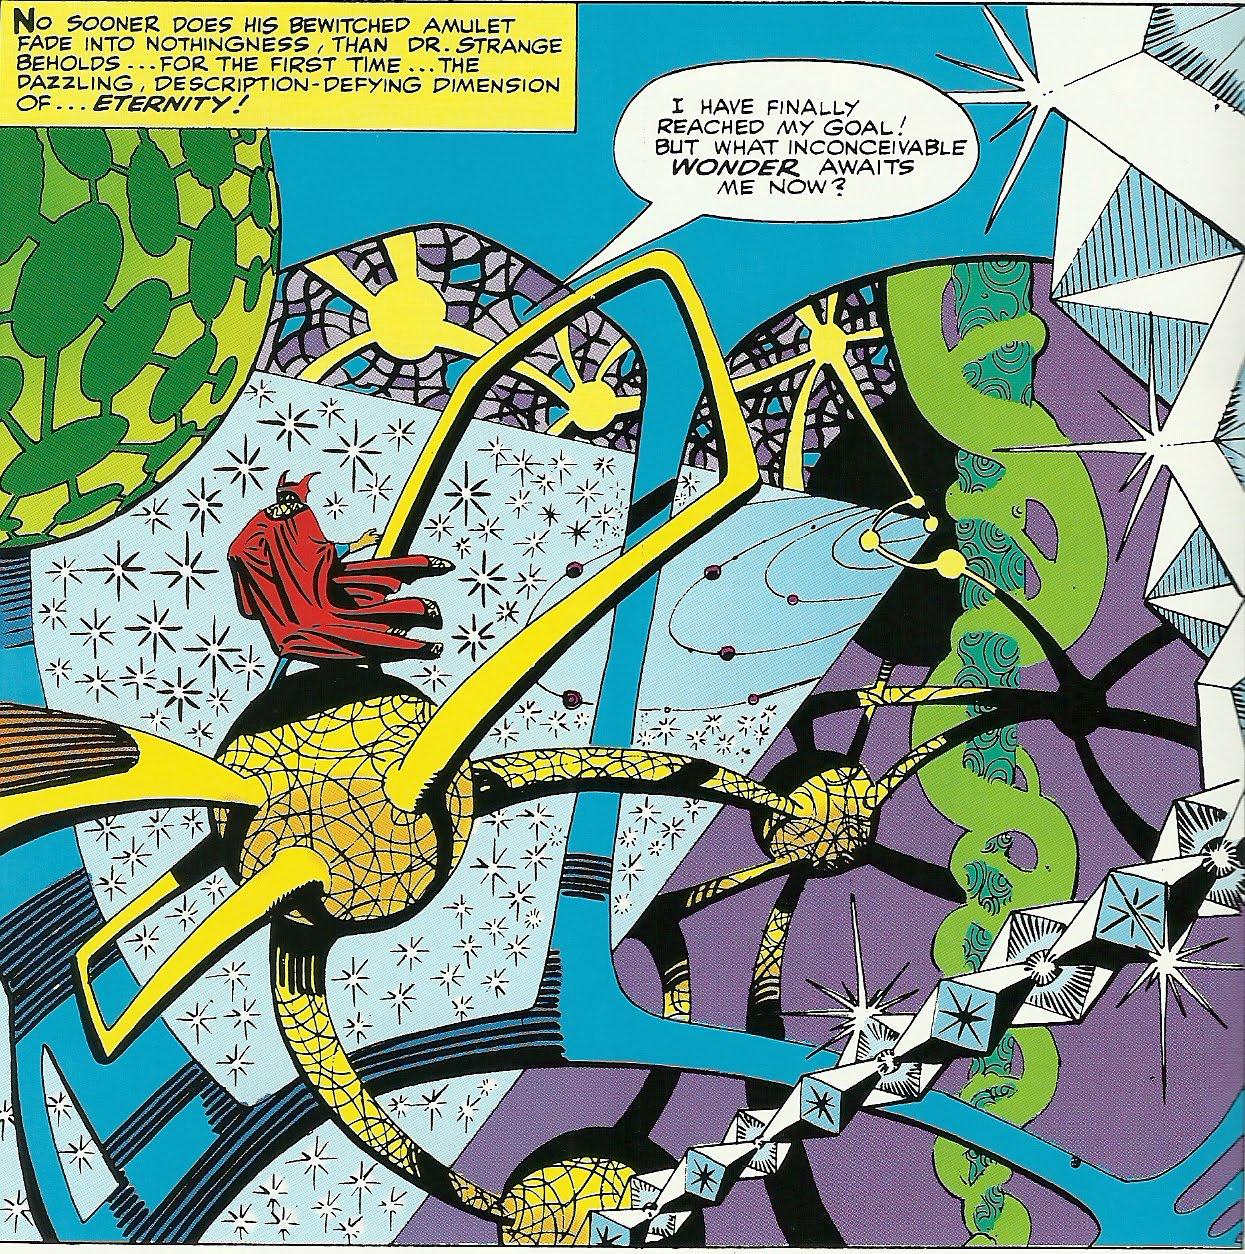 Doctor Strange (2016) Steve-Ditkos-Doctor-Strange